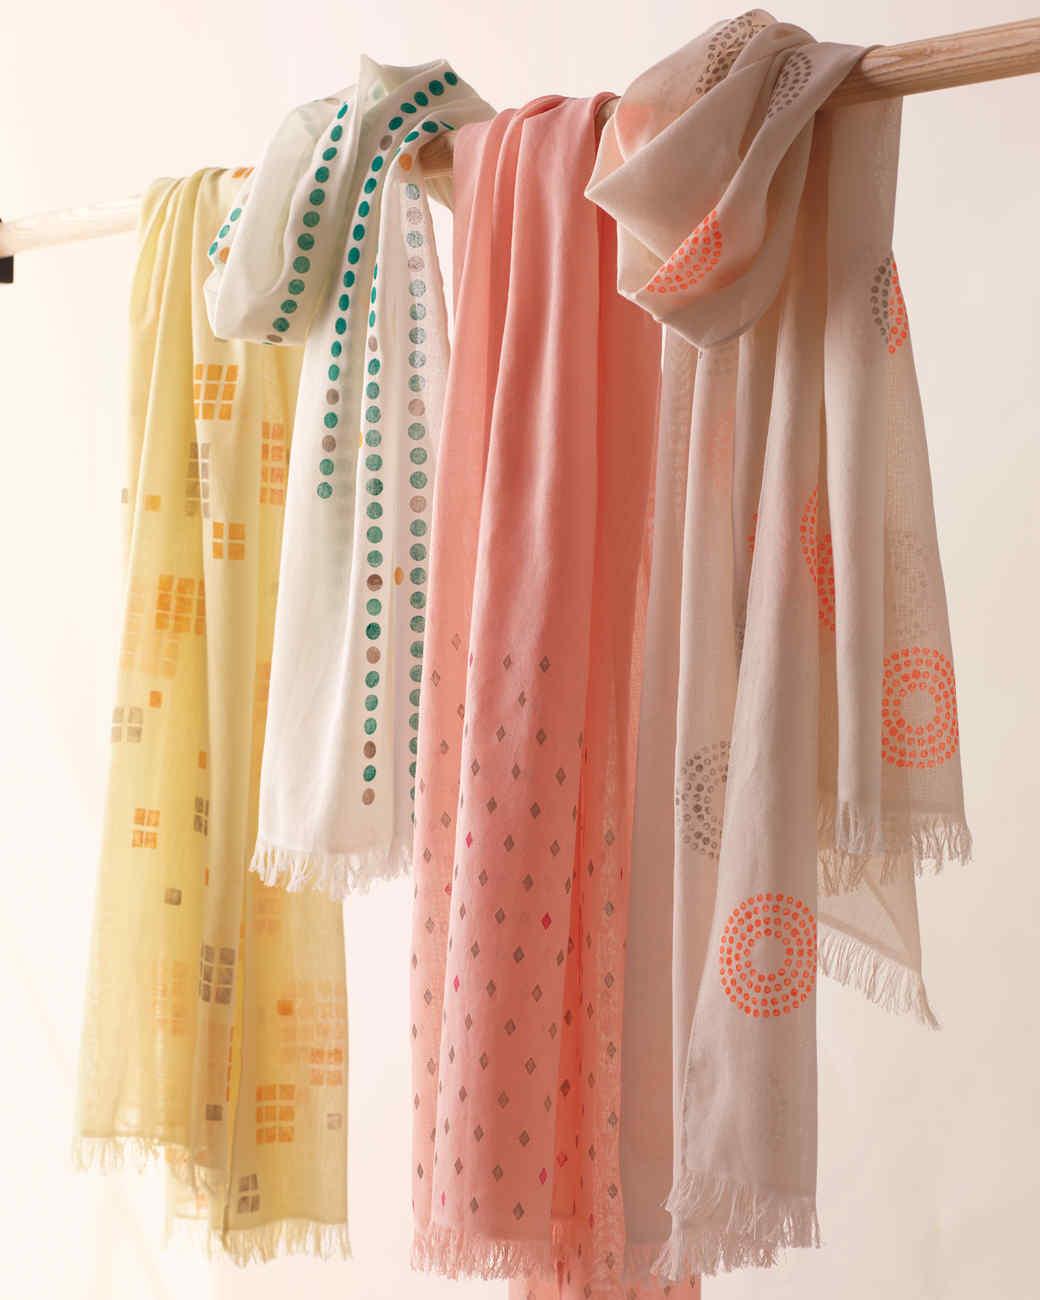 scarves-hanging-opt3-078-exp2-d112052.jpg